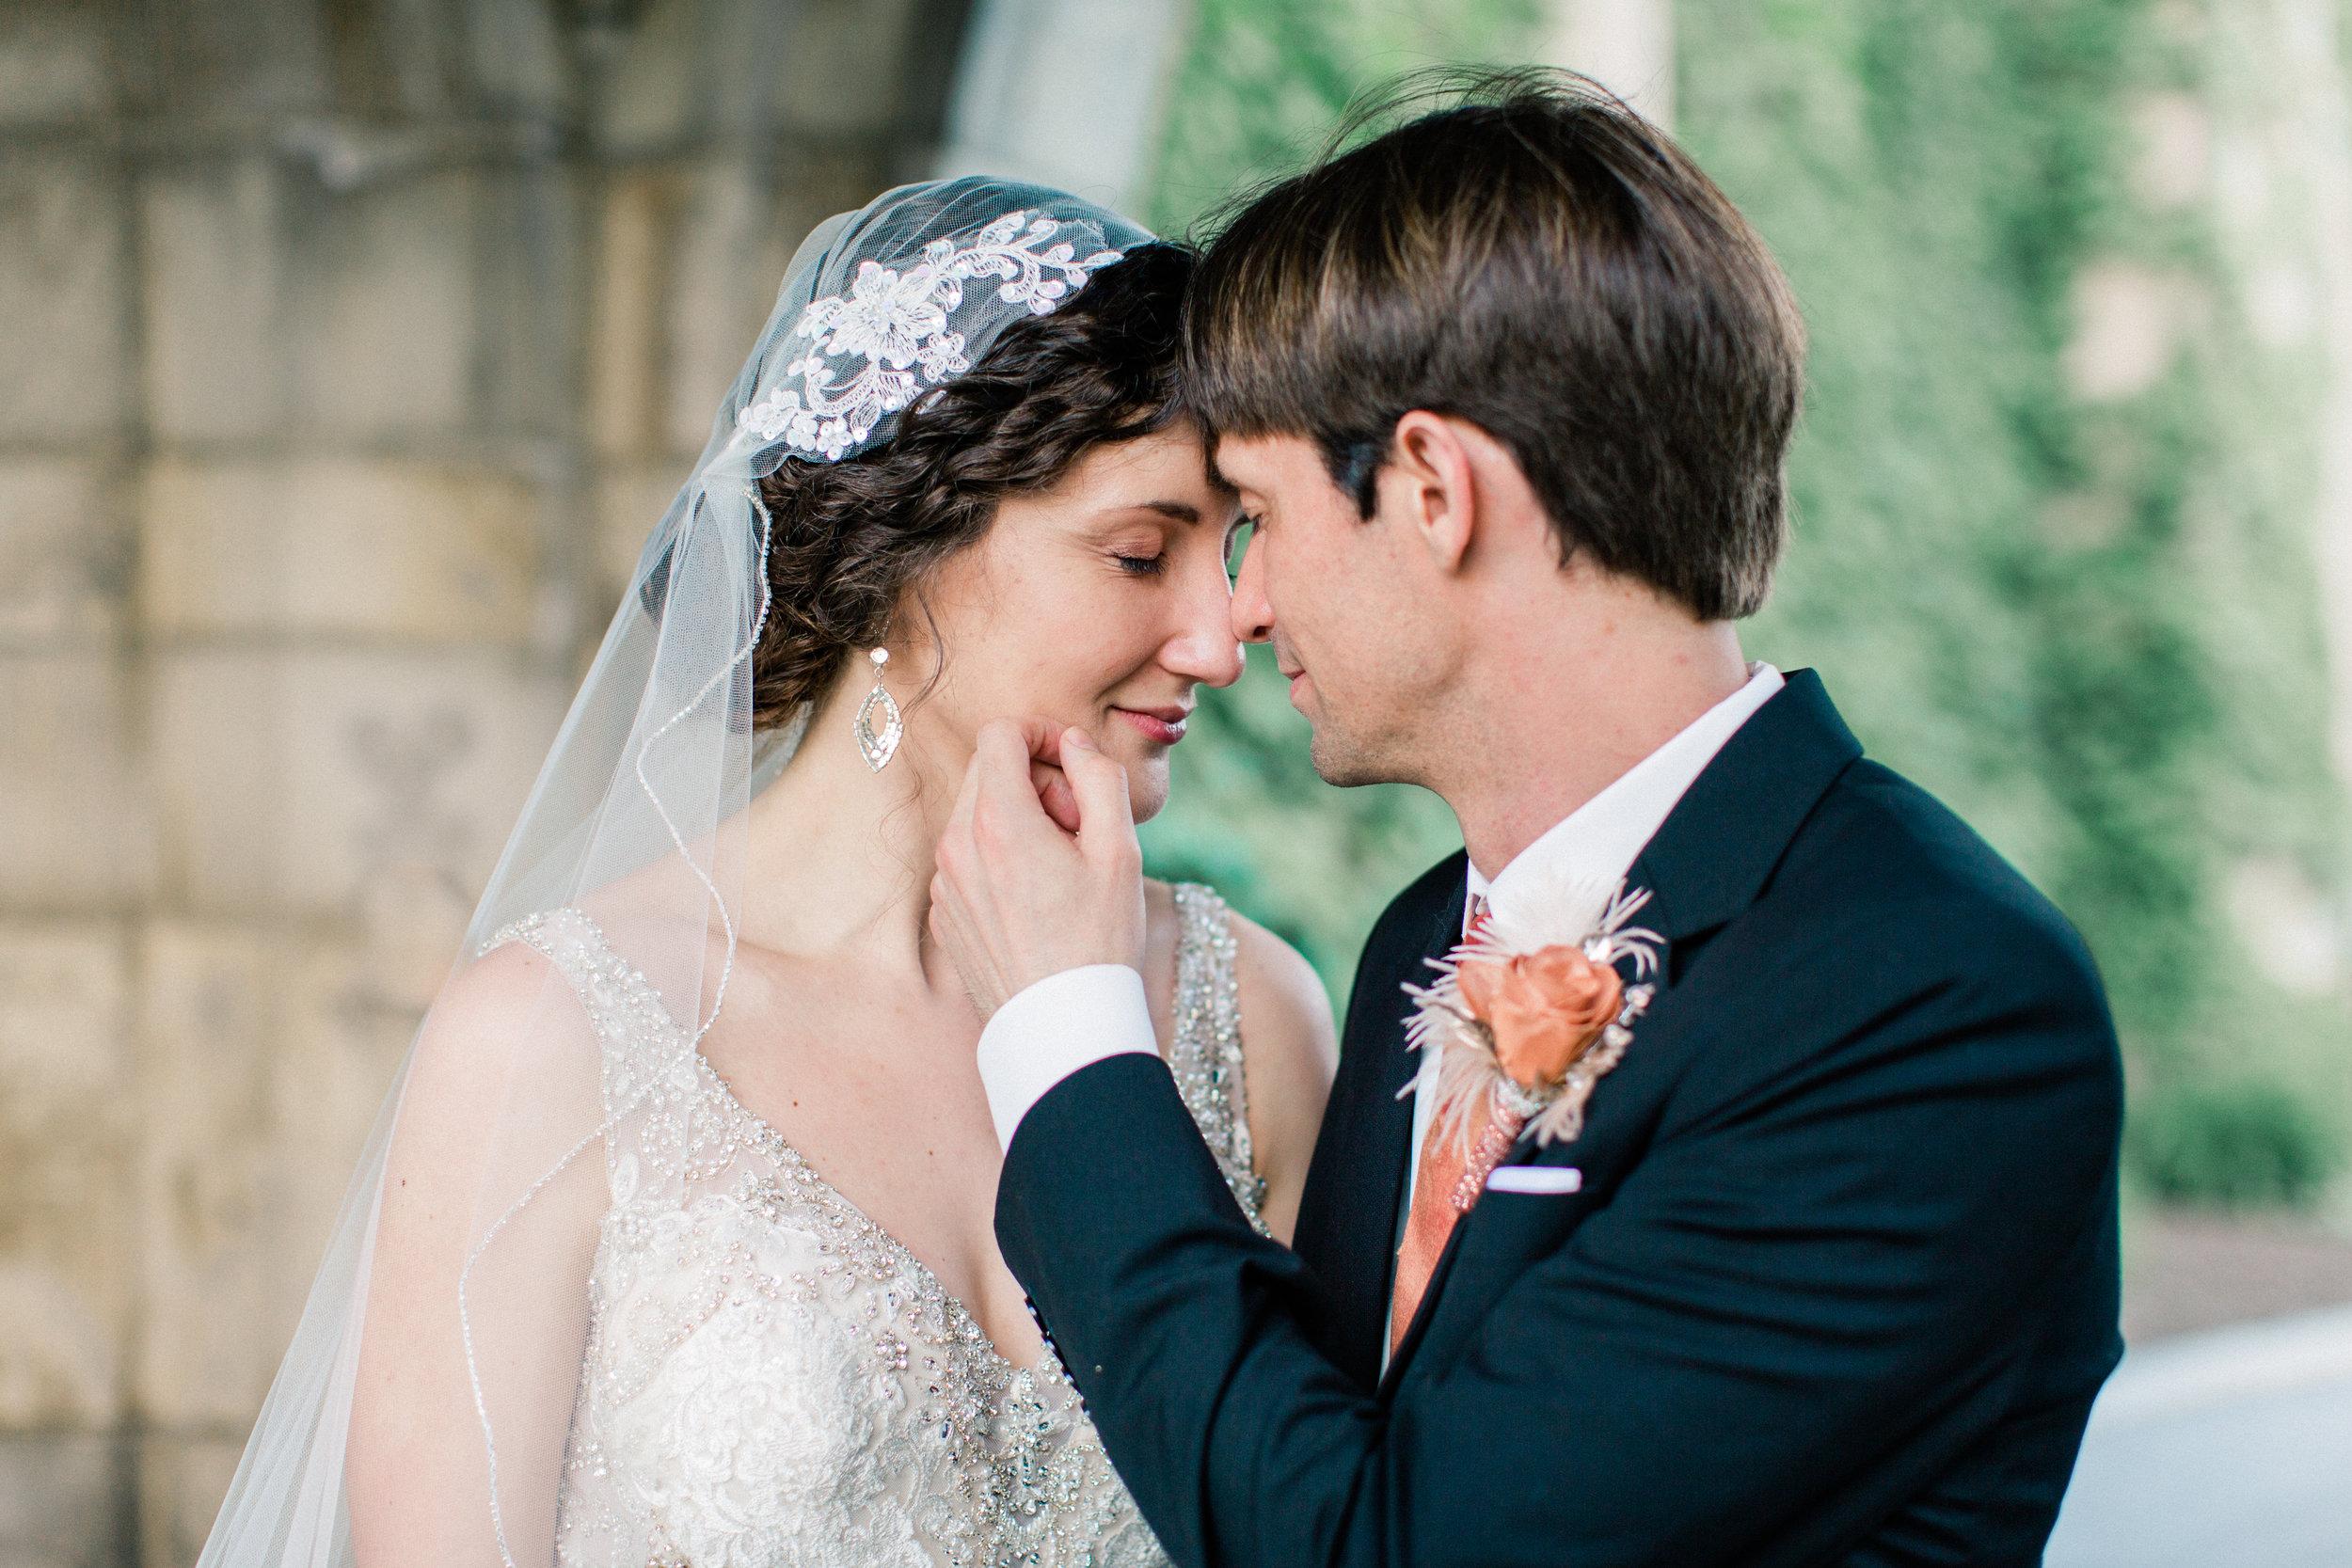 Dorothy_Louise_Photography_University_of_Chicago_Chapel_Wedding-47.jpg